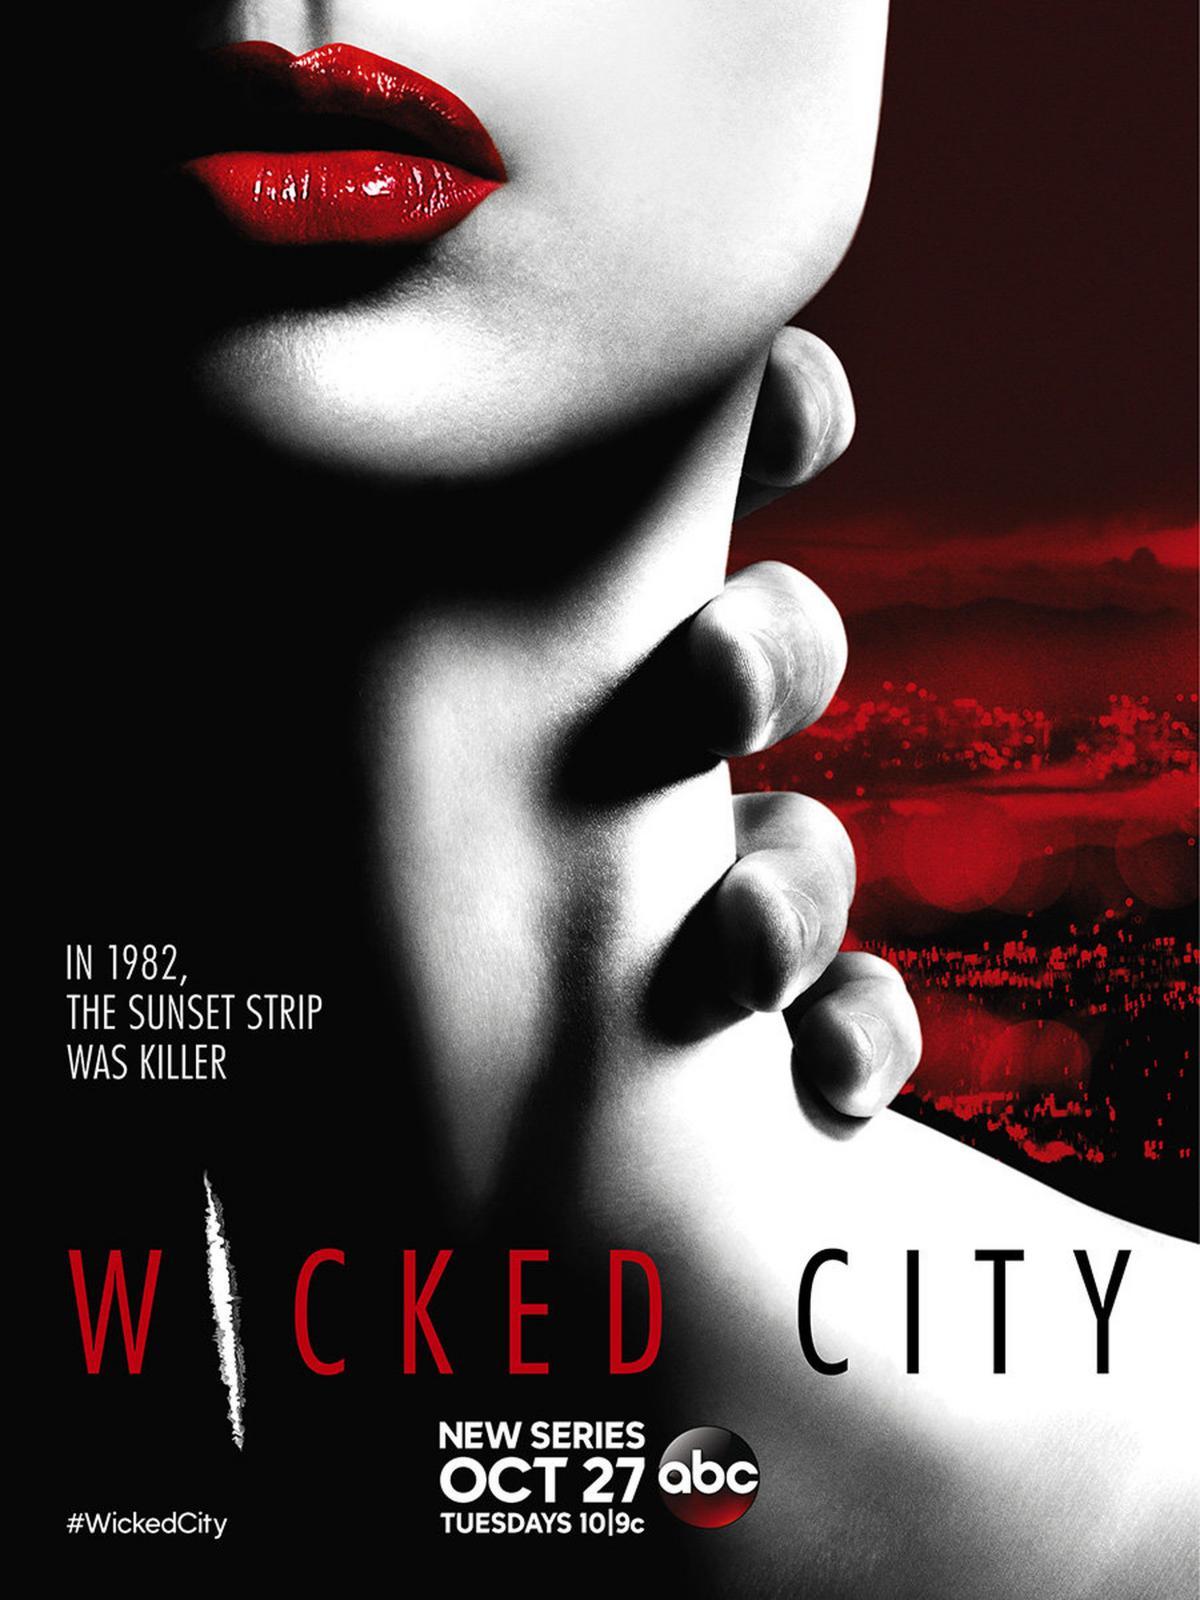 Сериал Злой город (Wicked City) - ПОСТЕР 1 СЕЗОНА.jpg